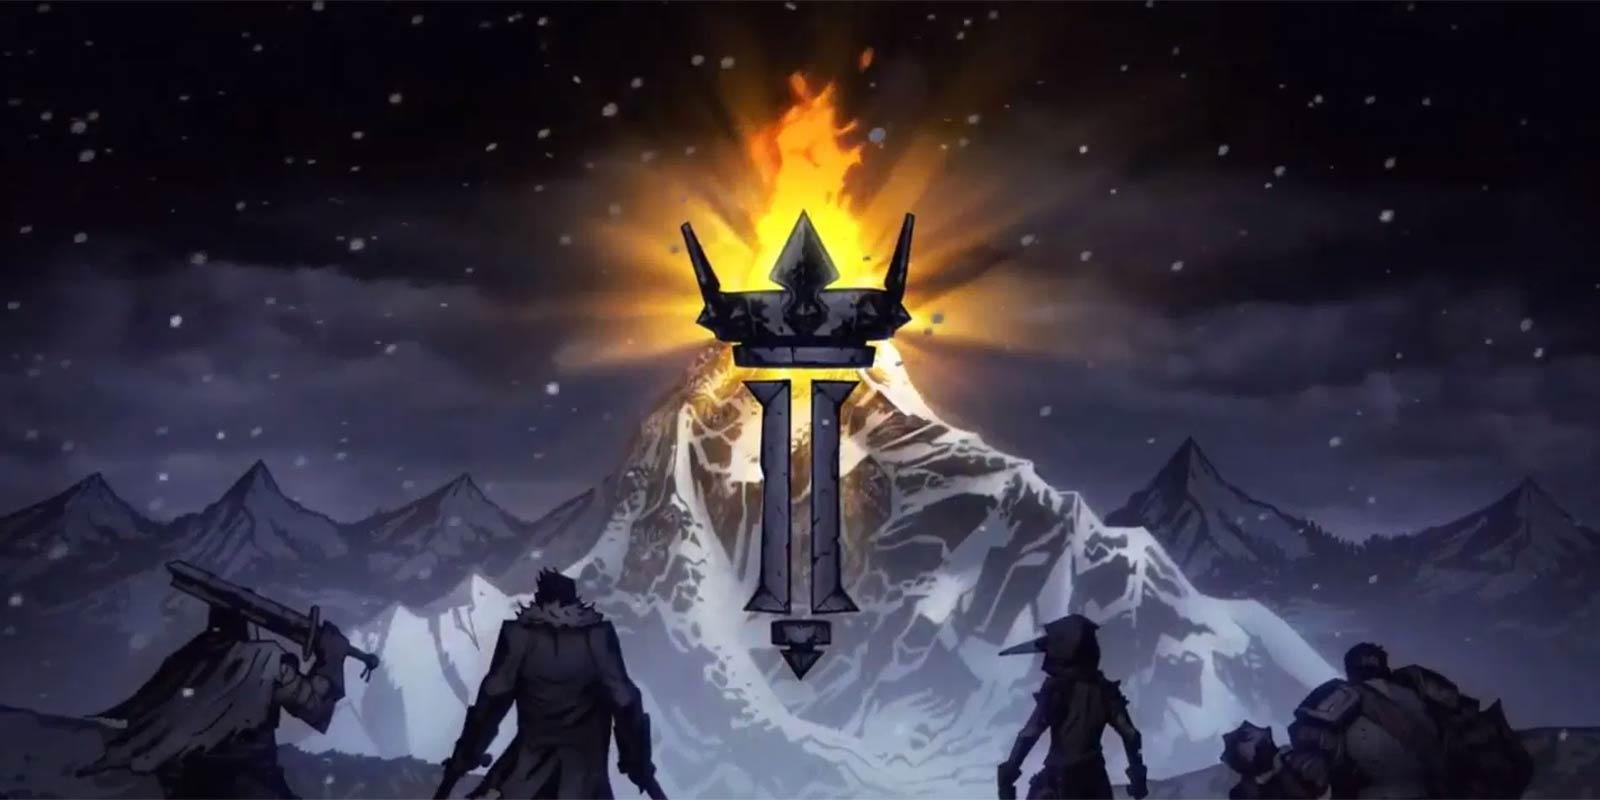 Darkest Dungeons season 2: Release Date, Cast, New Season/Cancelled?